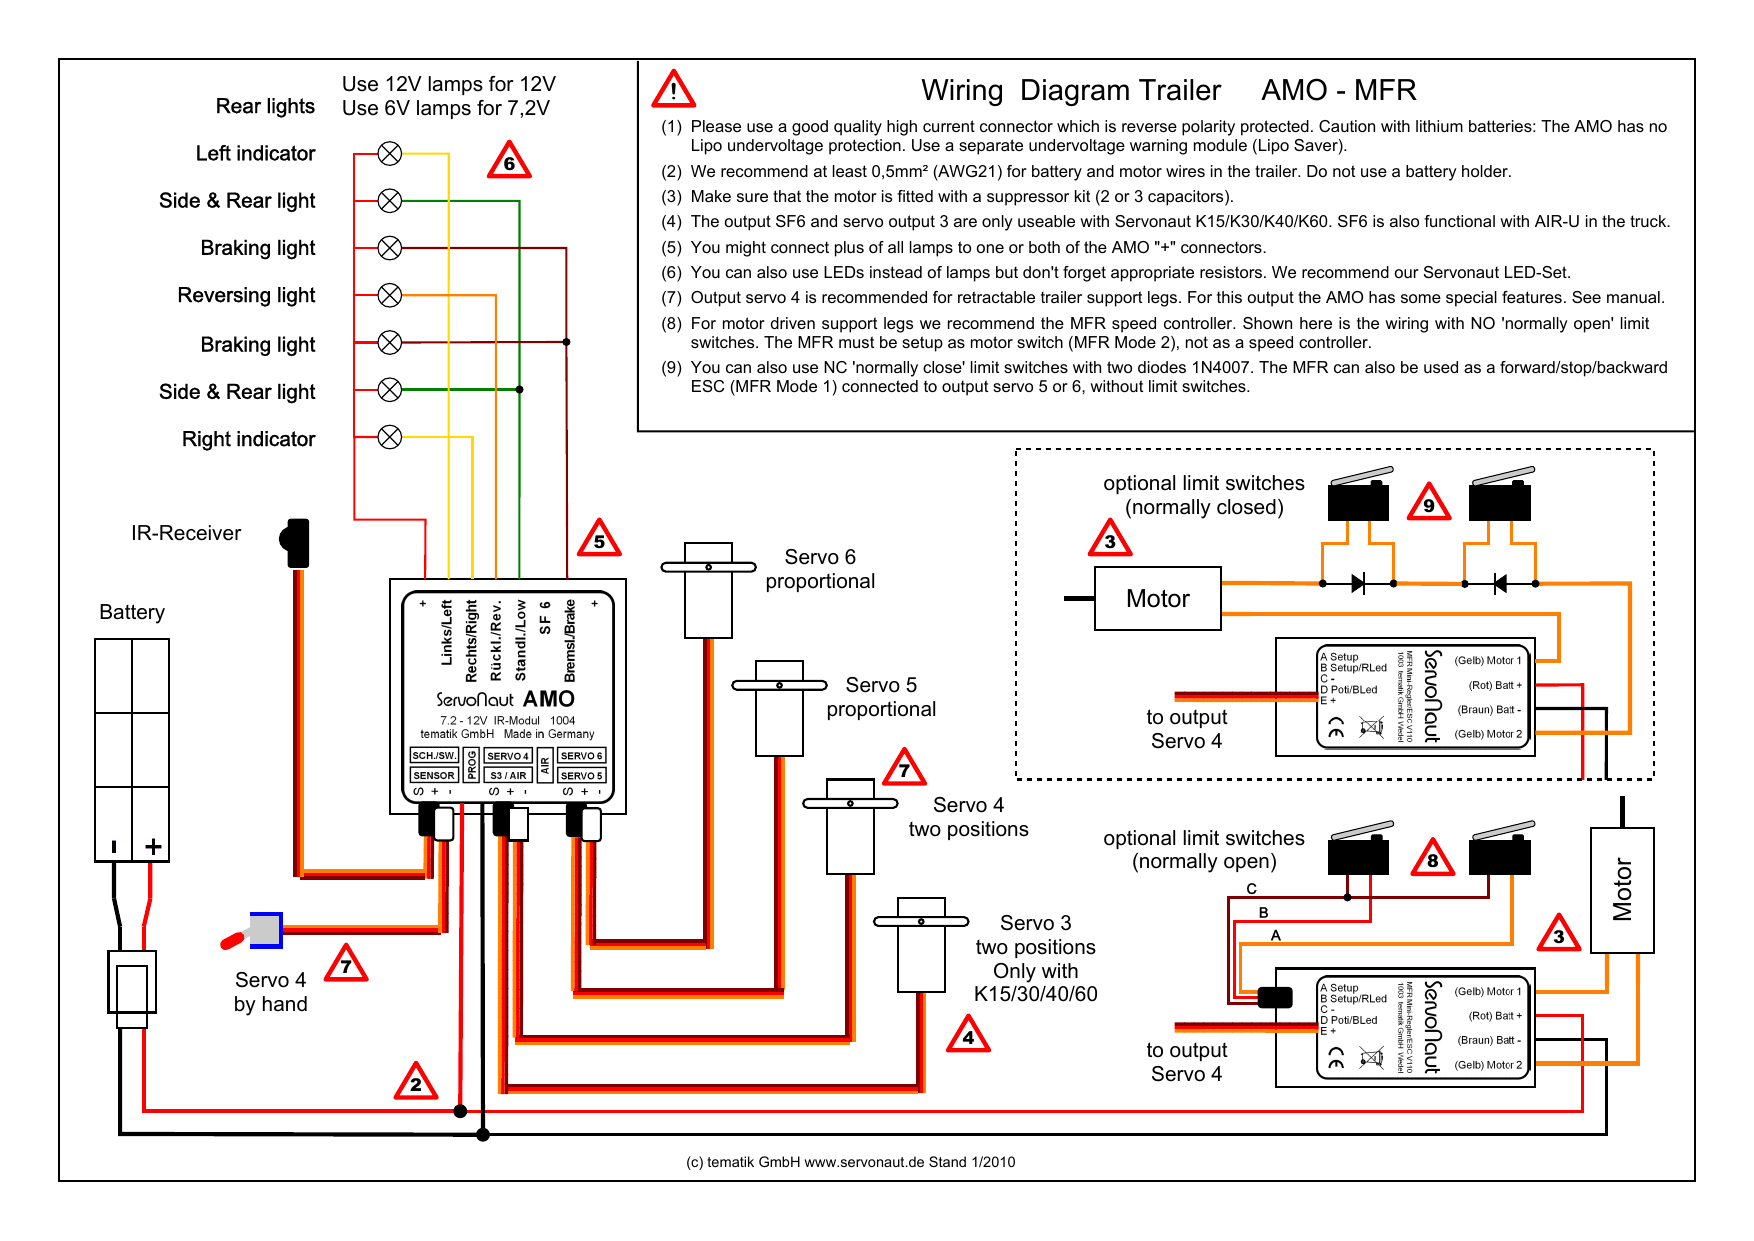 hight resolution of wiring diagram trailer amo mfr